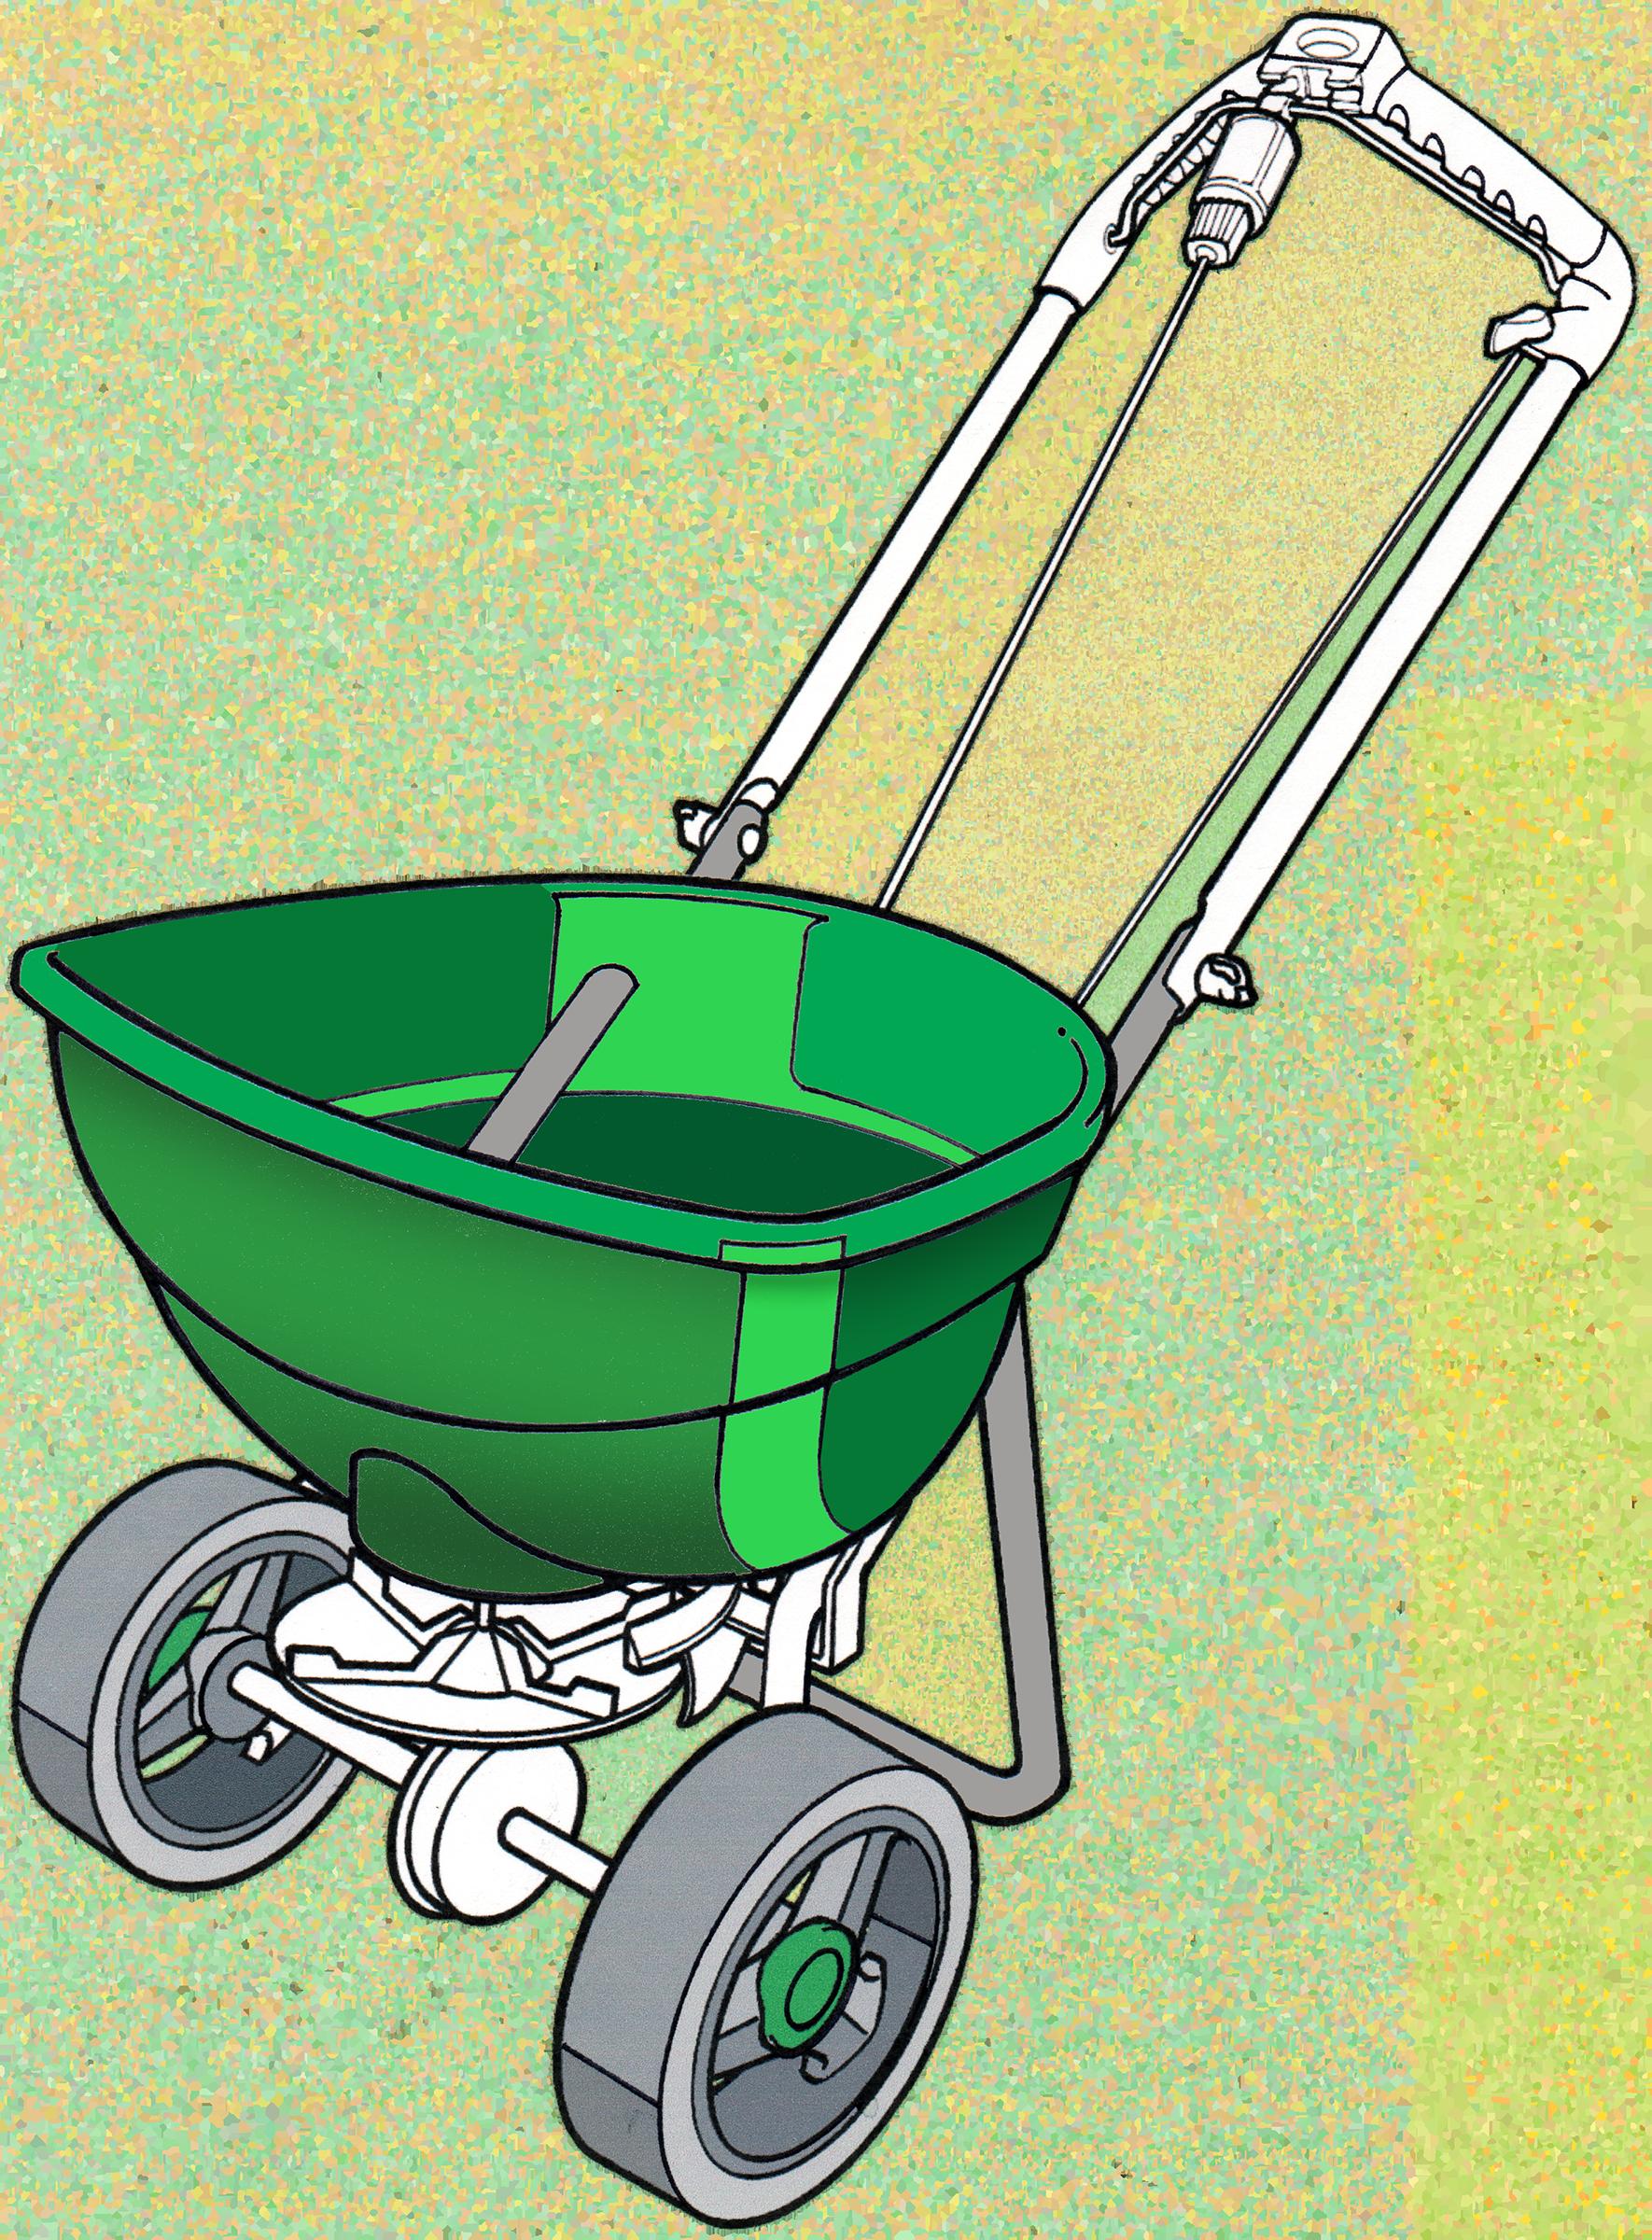 Scott's Lawn Spreader Concept